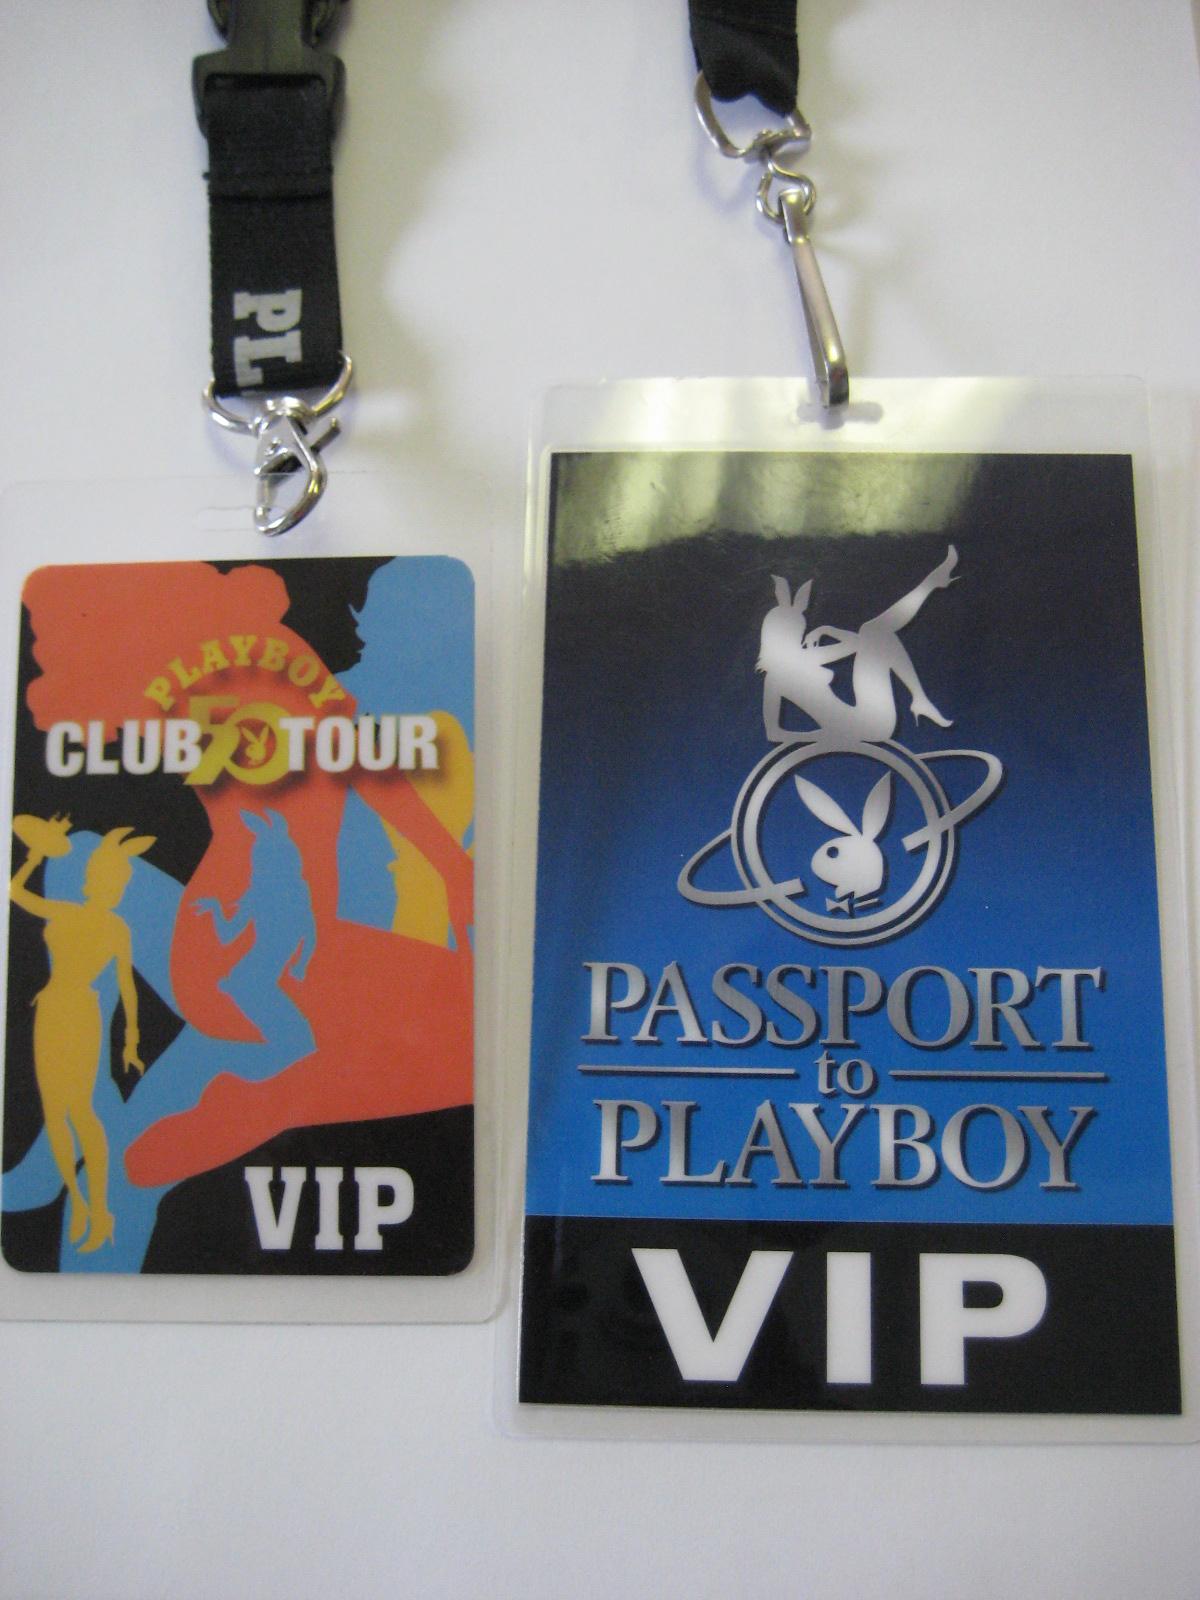 Playboy Club Tour